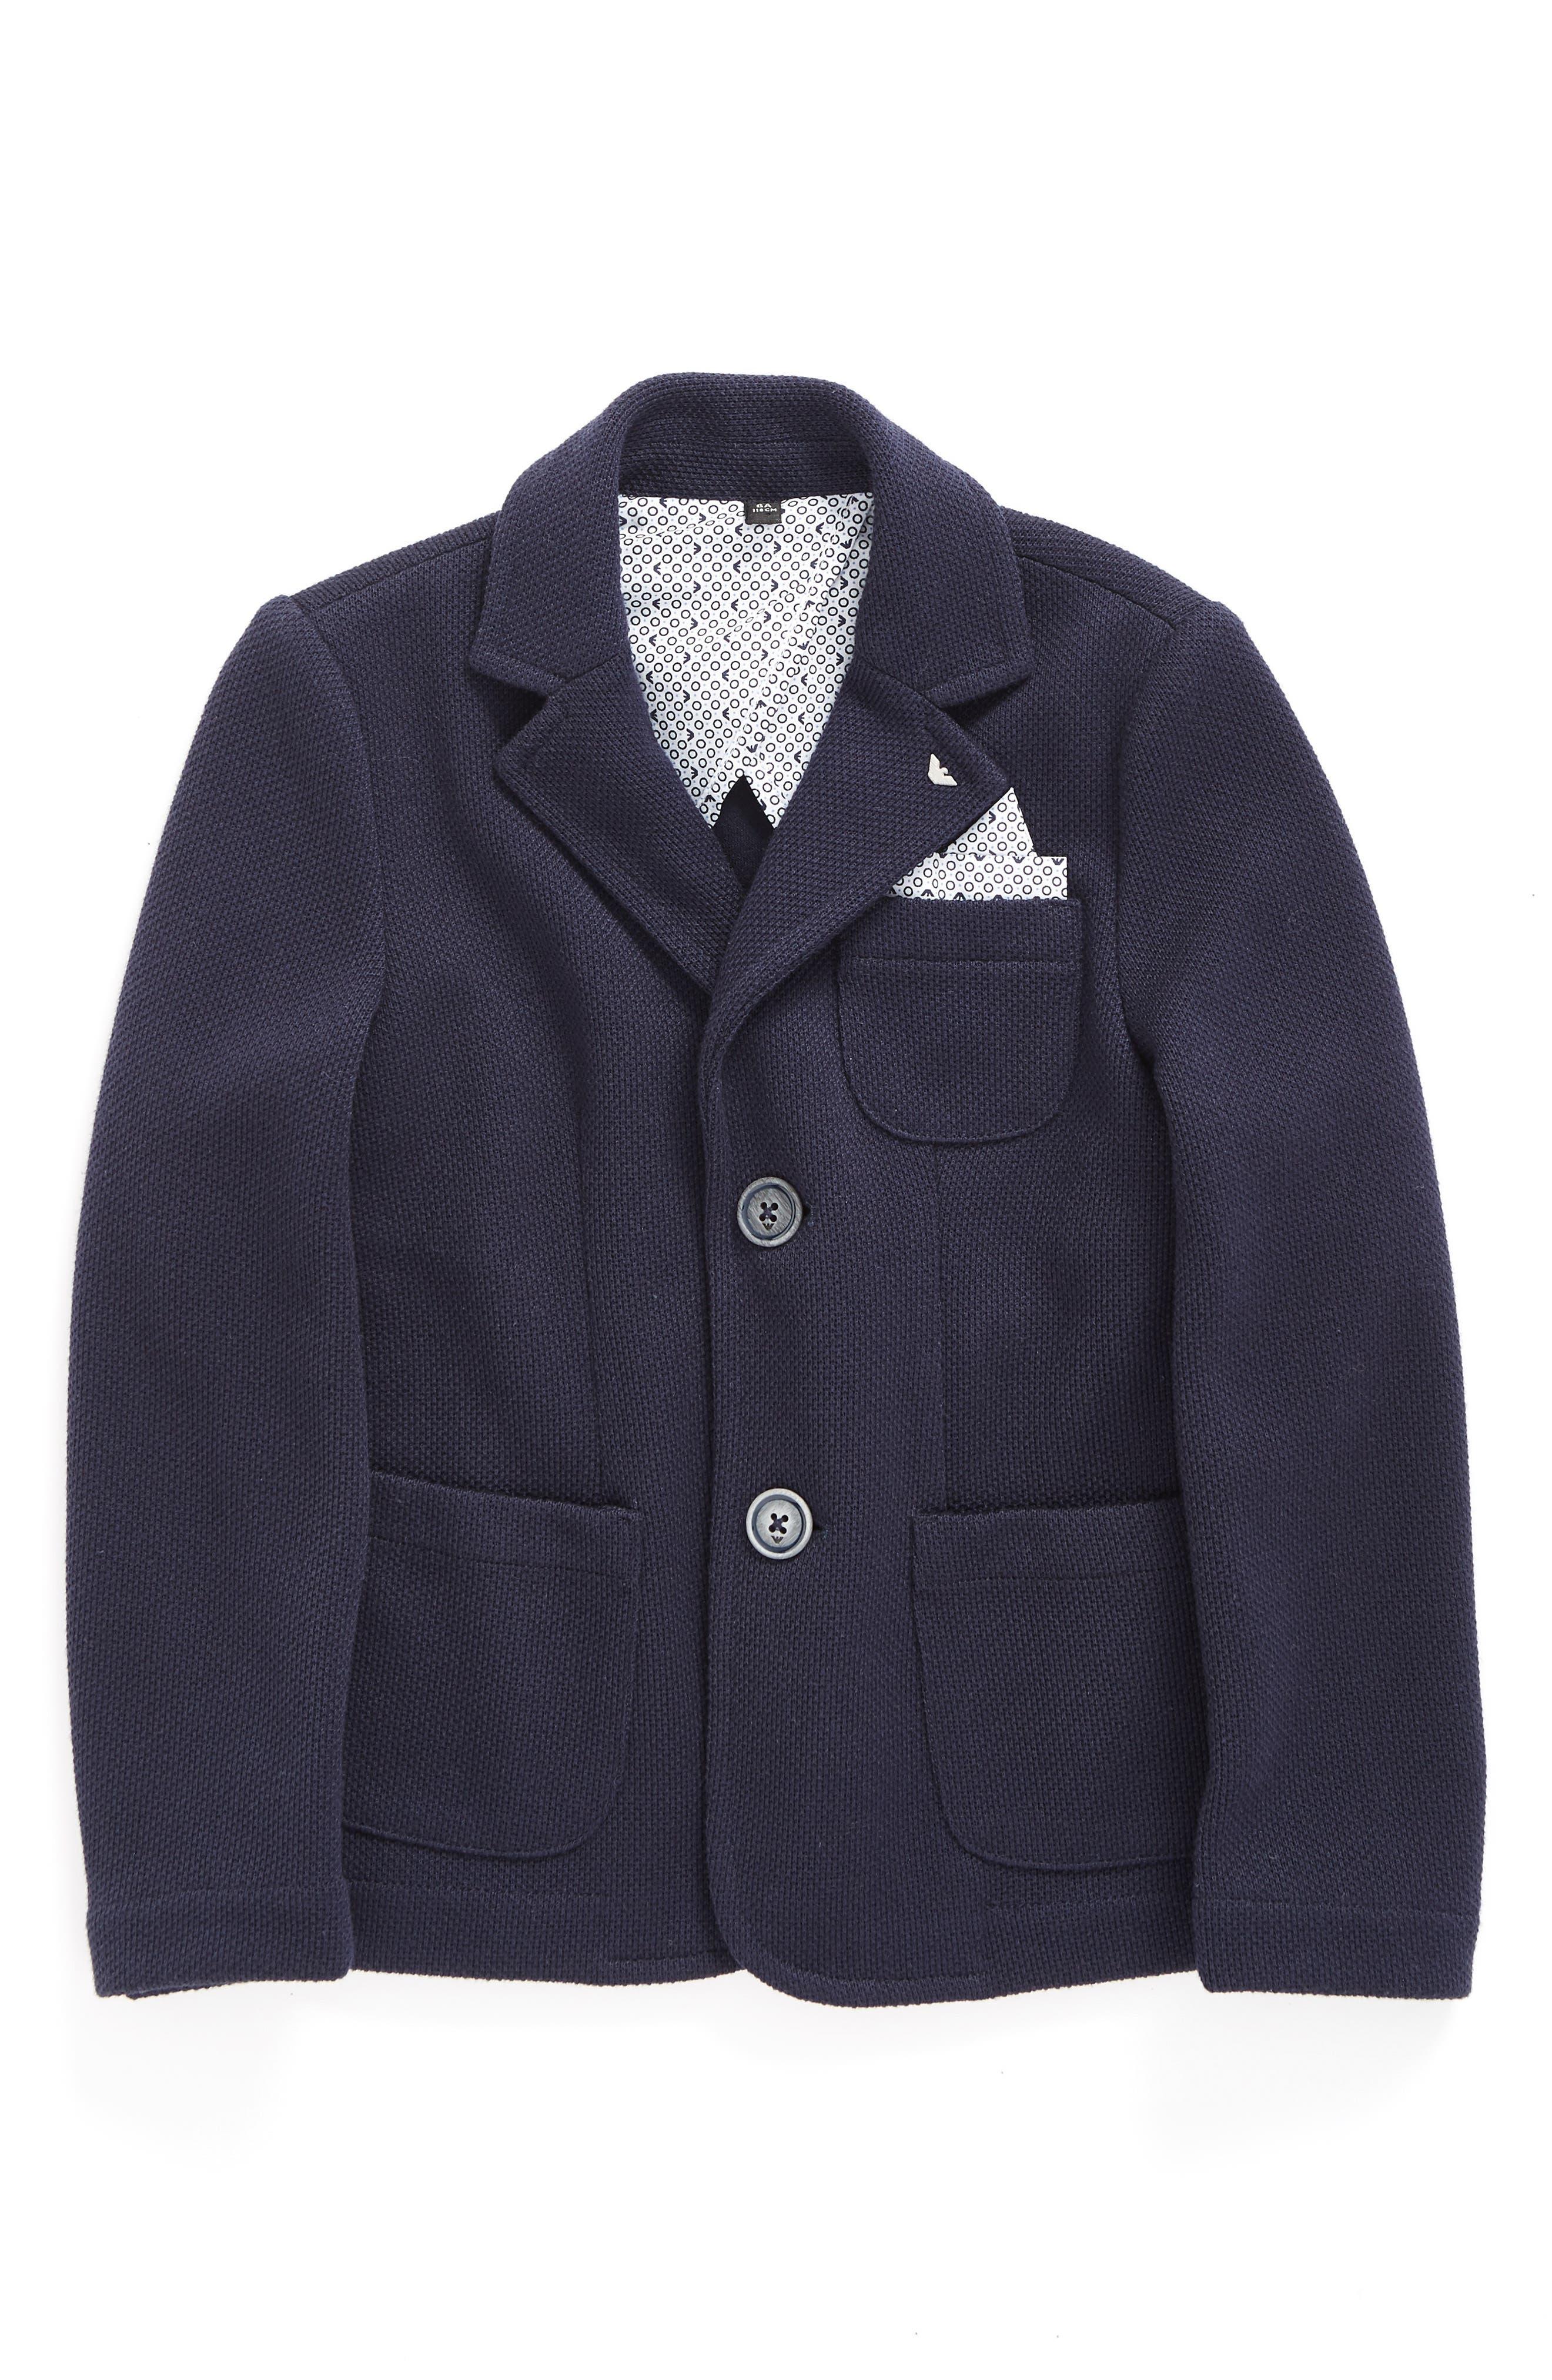 Main Image - Armani Junior Knit Blazer with Pocket Square (Little Boys & Big Boys)